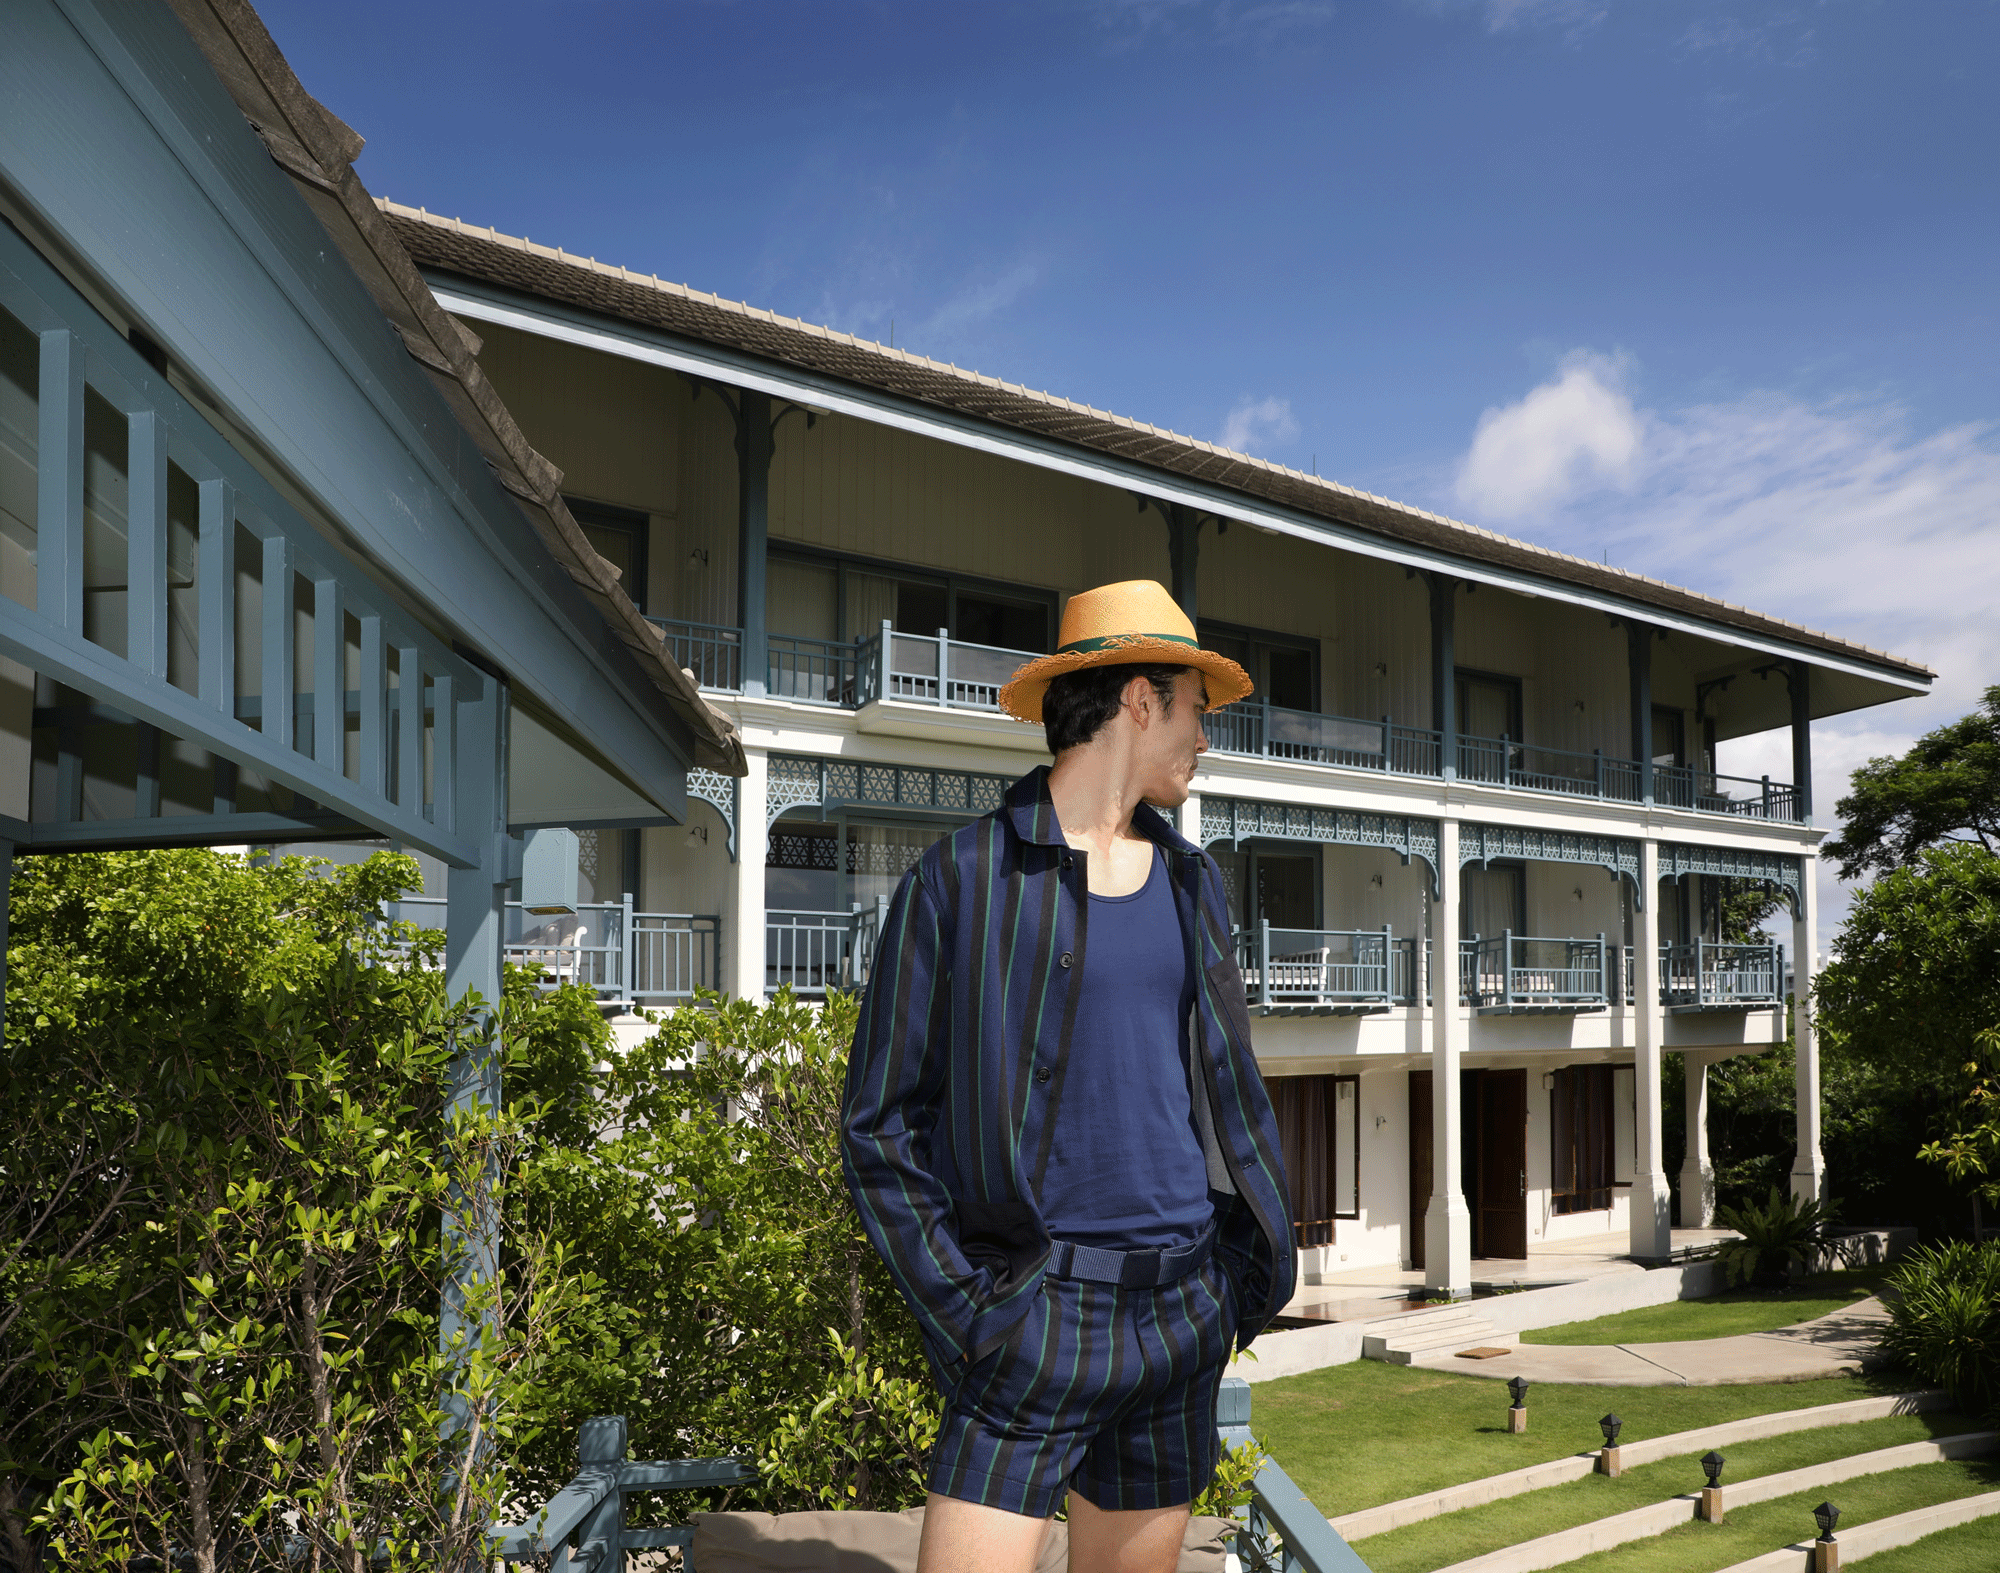 tank top : JOCKEY / jacket and shorts : Leisure Projects / hat : Famosa Andina